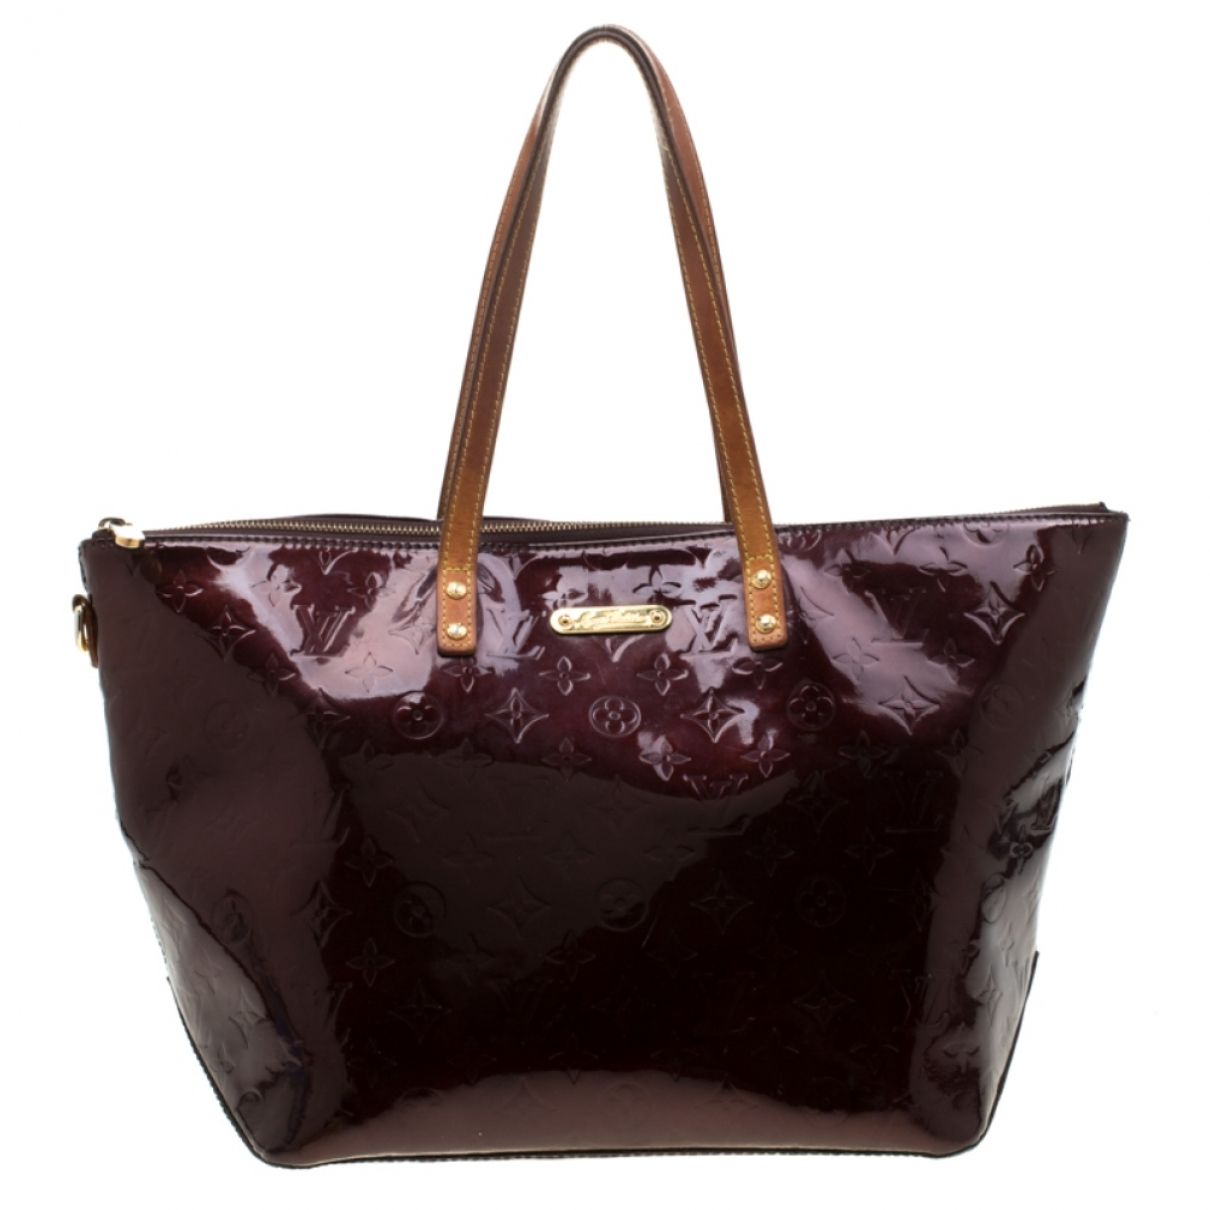 Louis Vuitton Bellevue Handtasche in  Lila Lackleder